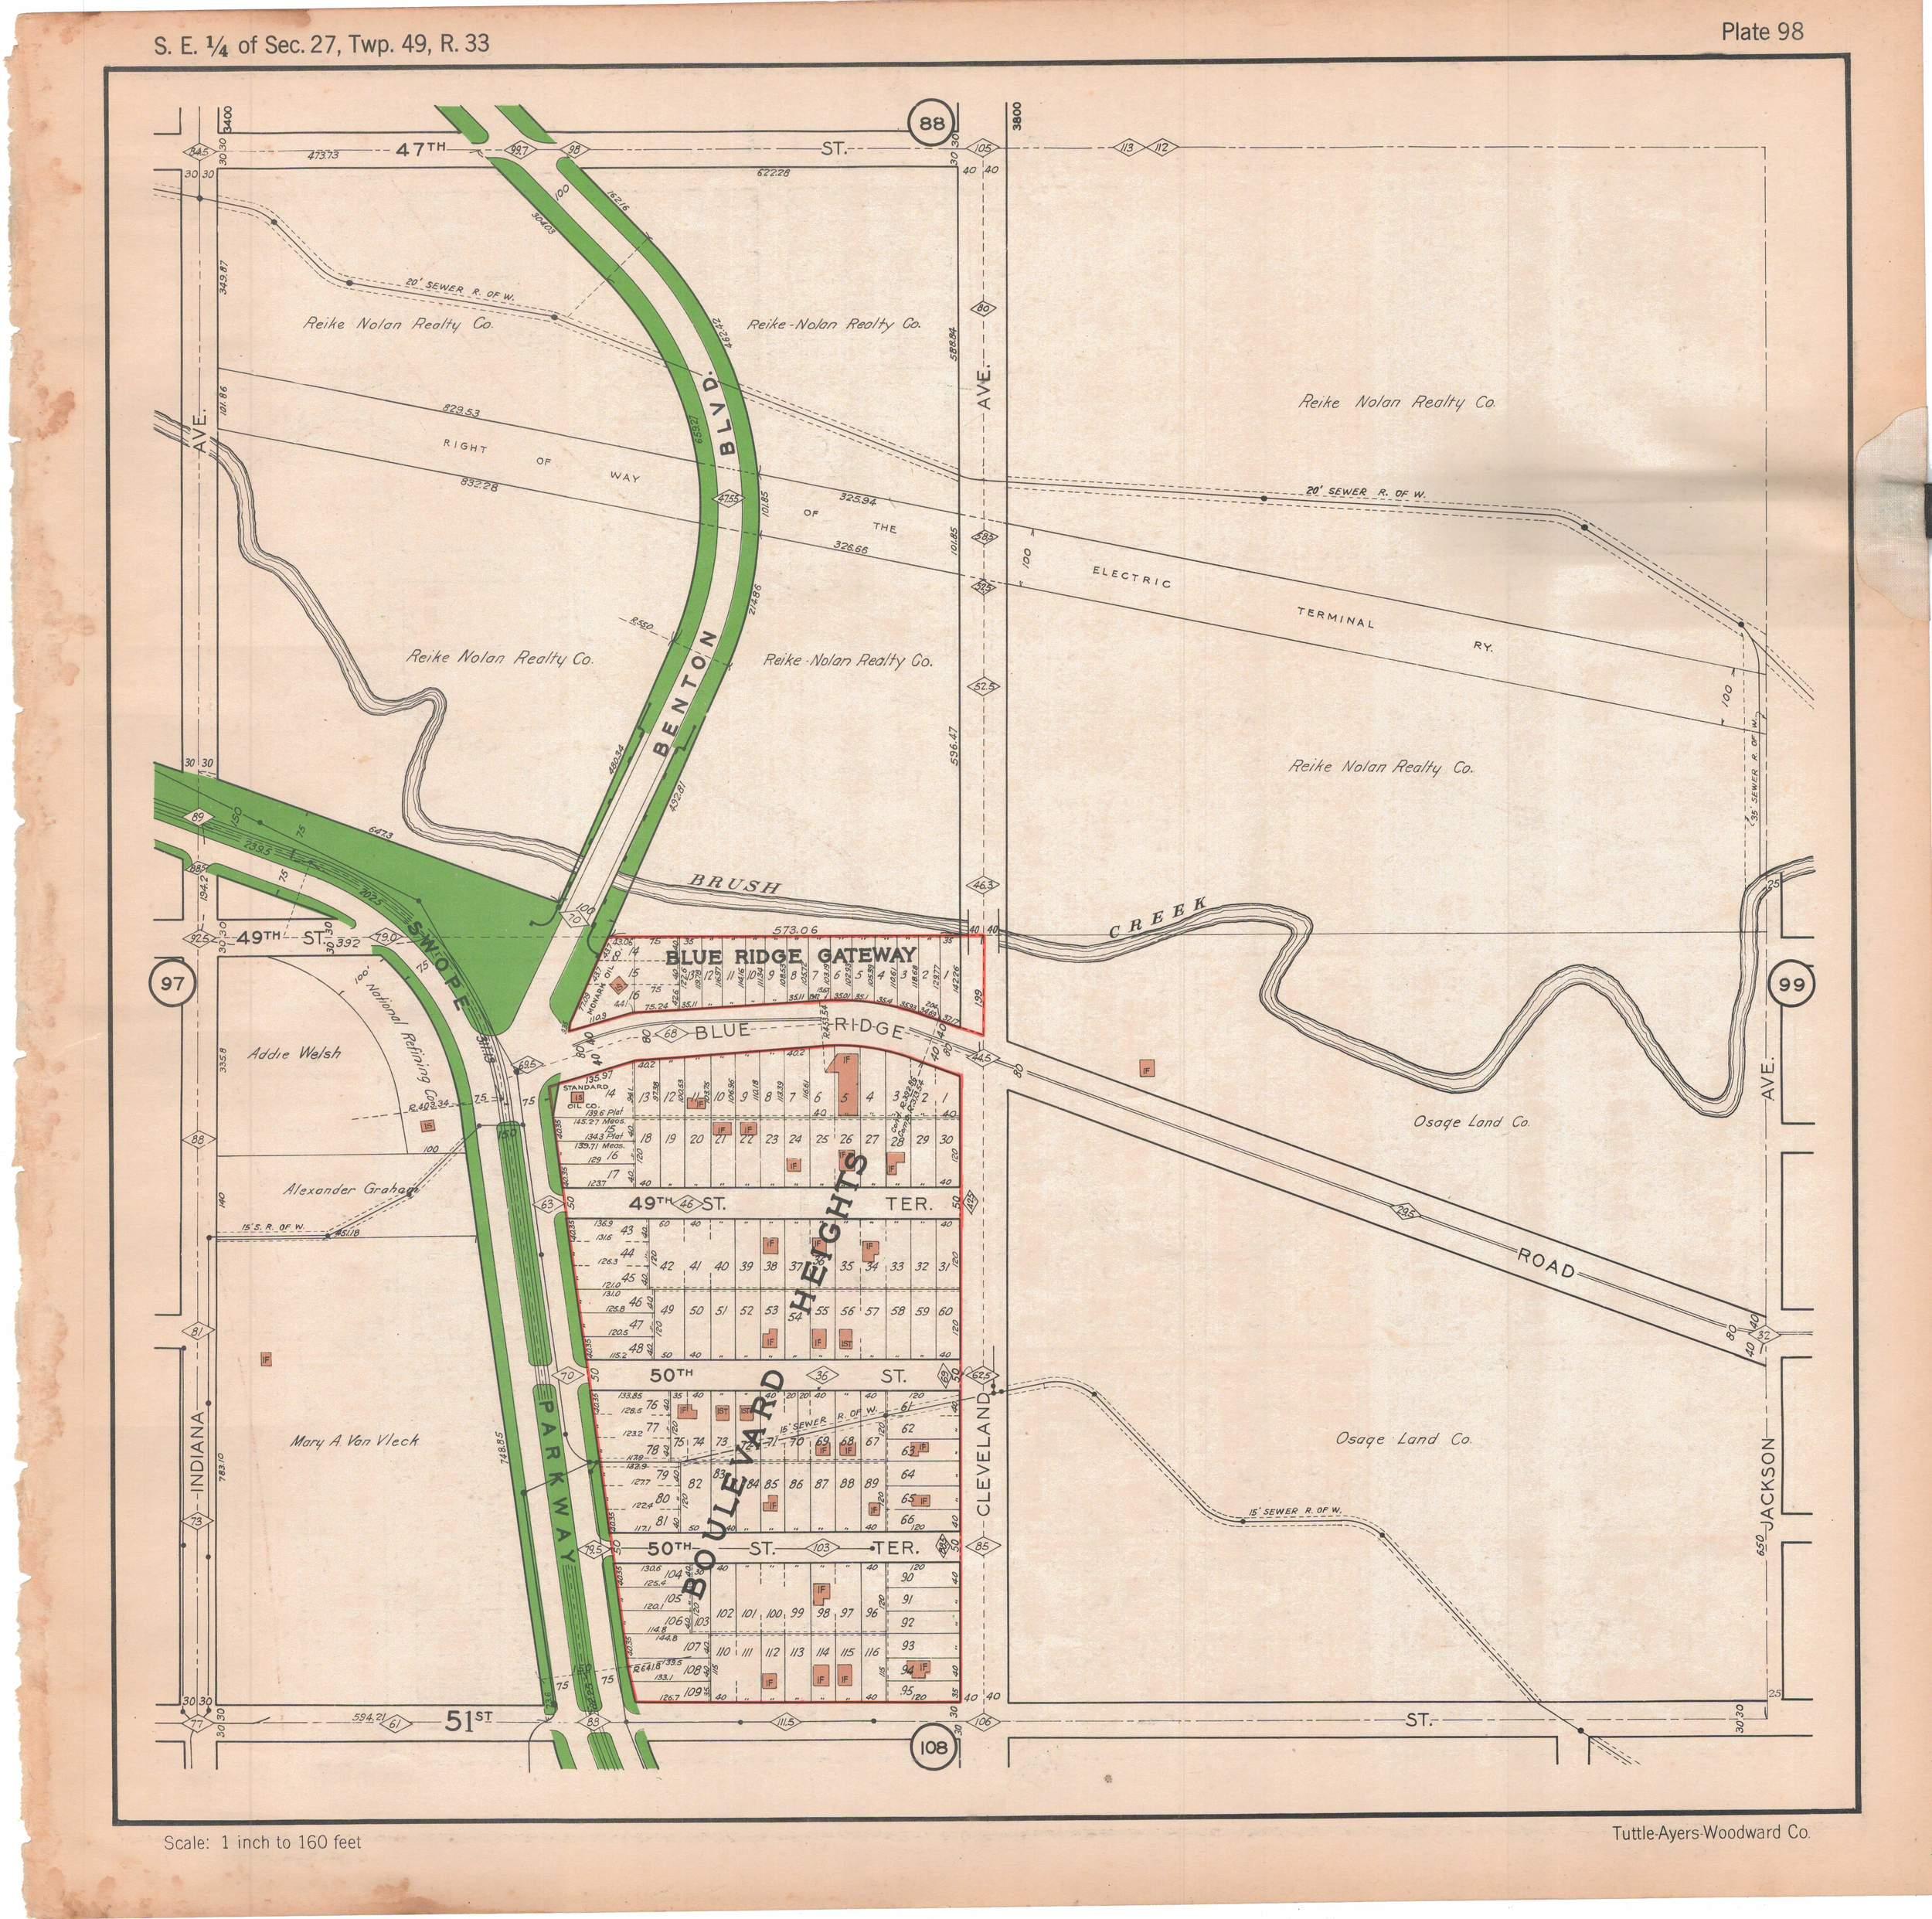 1925 TUTTLE_AYERS_Plate 98.JPG